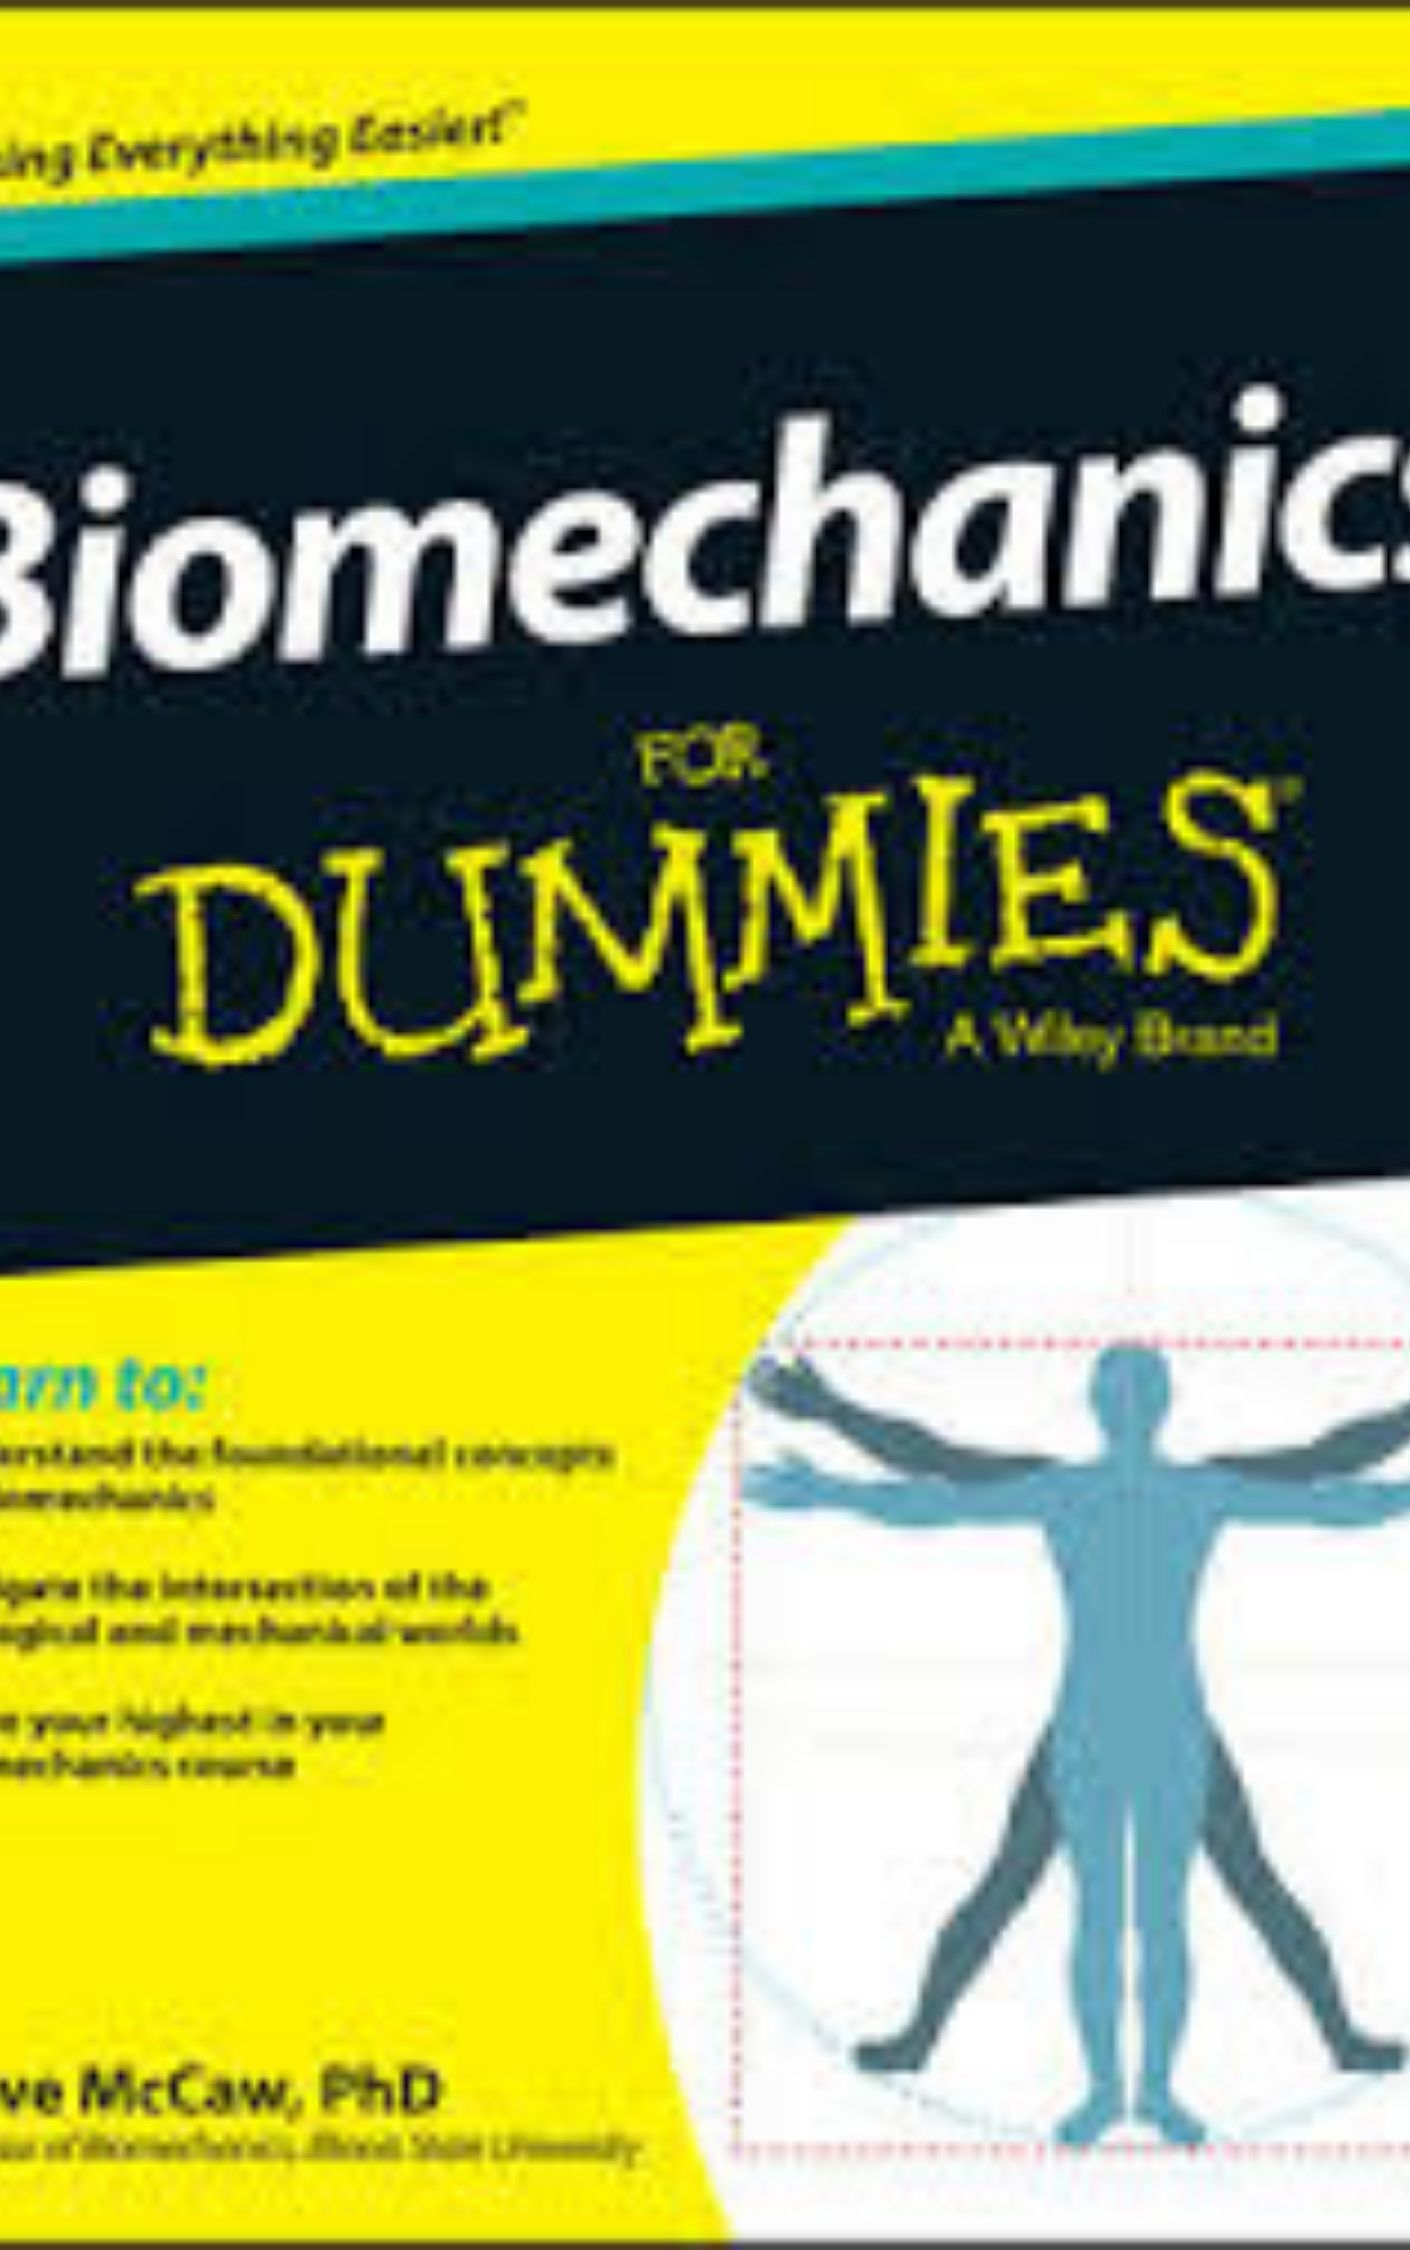 Biomechanics For Dummies by Steve McCaw